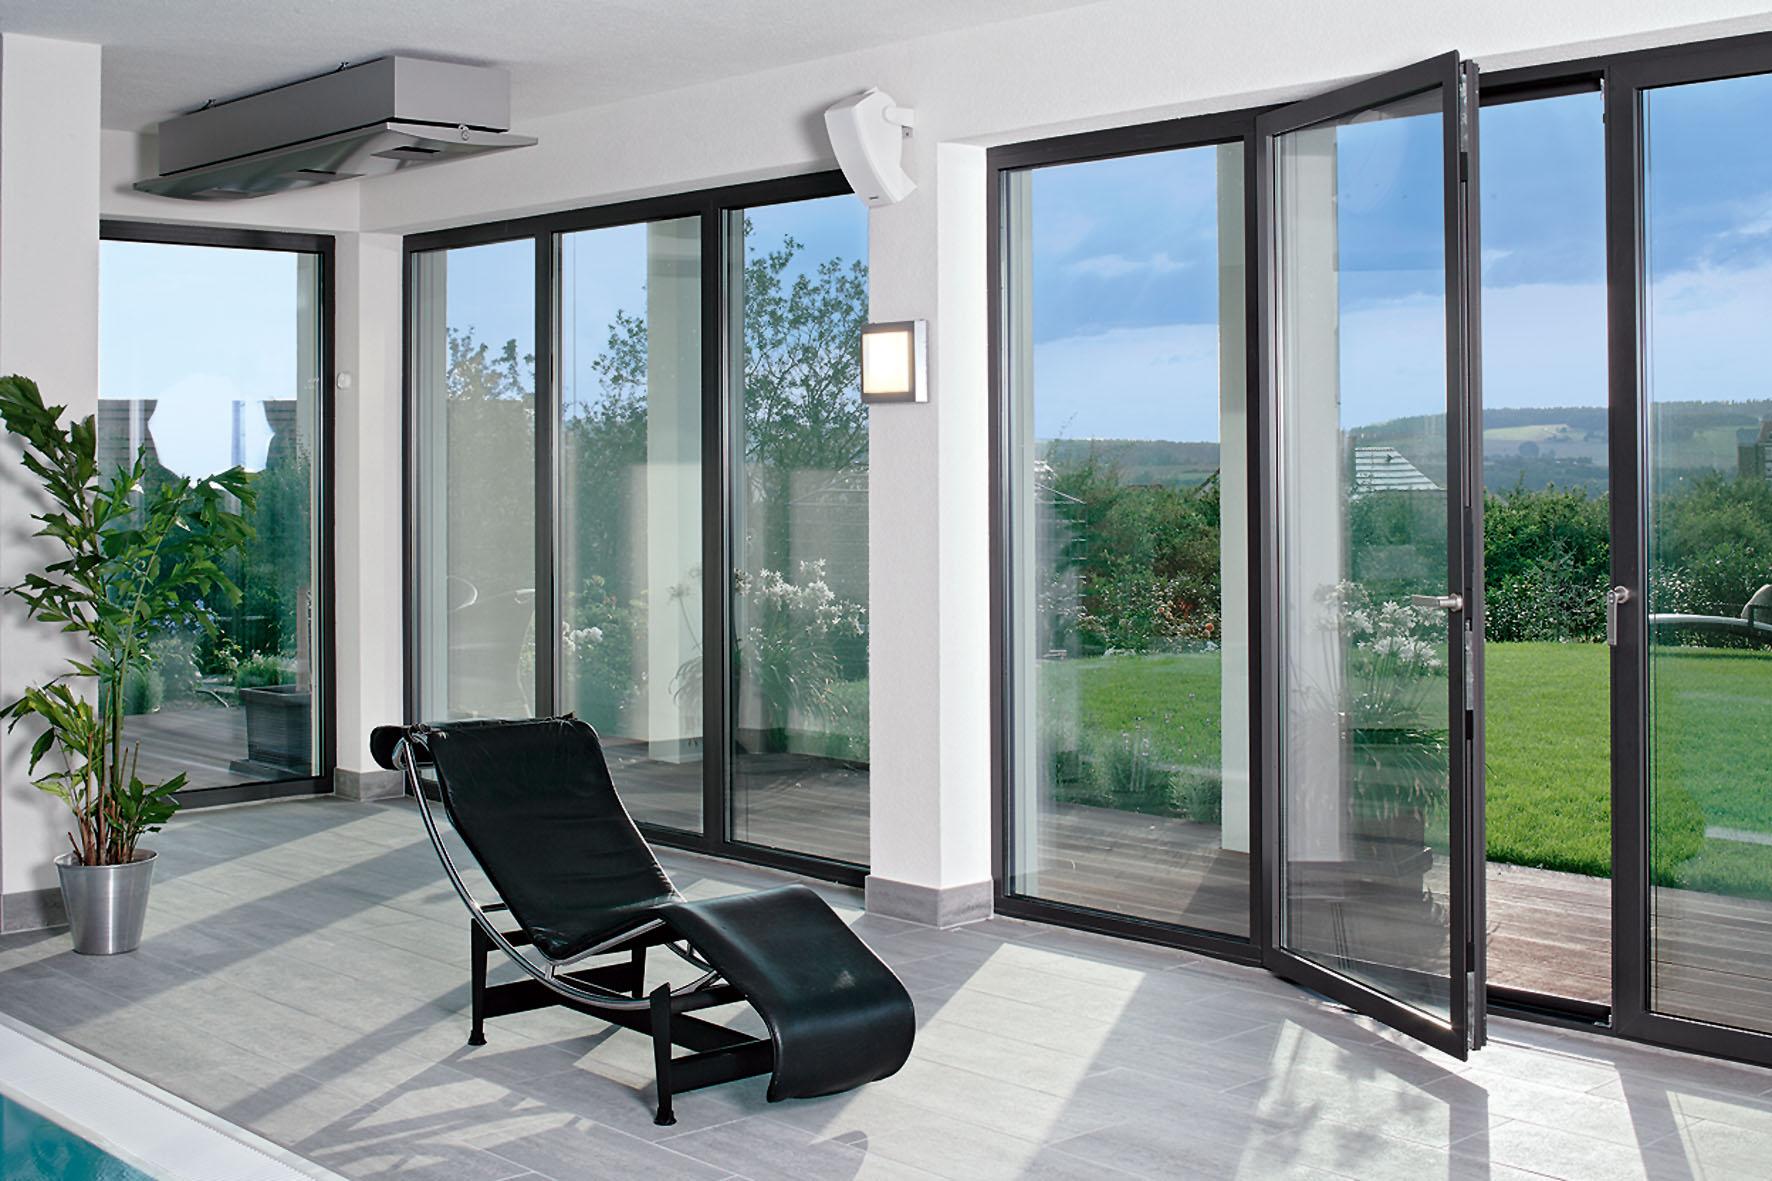 r so gmbh t ren fenster fassaden. Black Bedroom Furniture Sets. Home Design Ideas